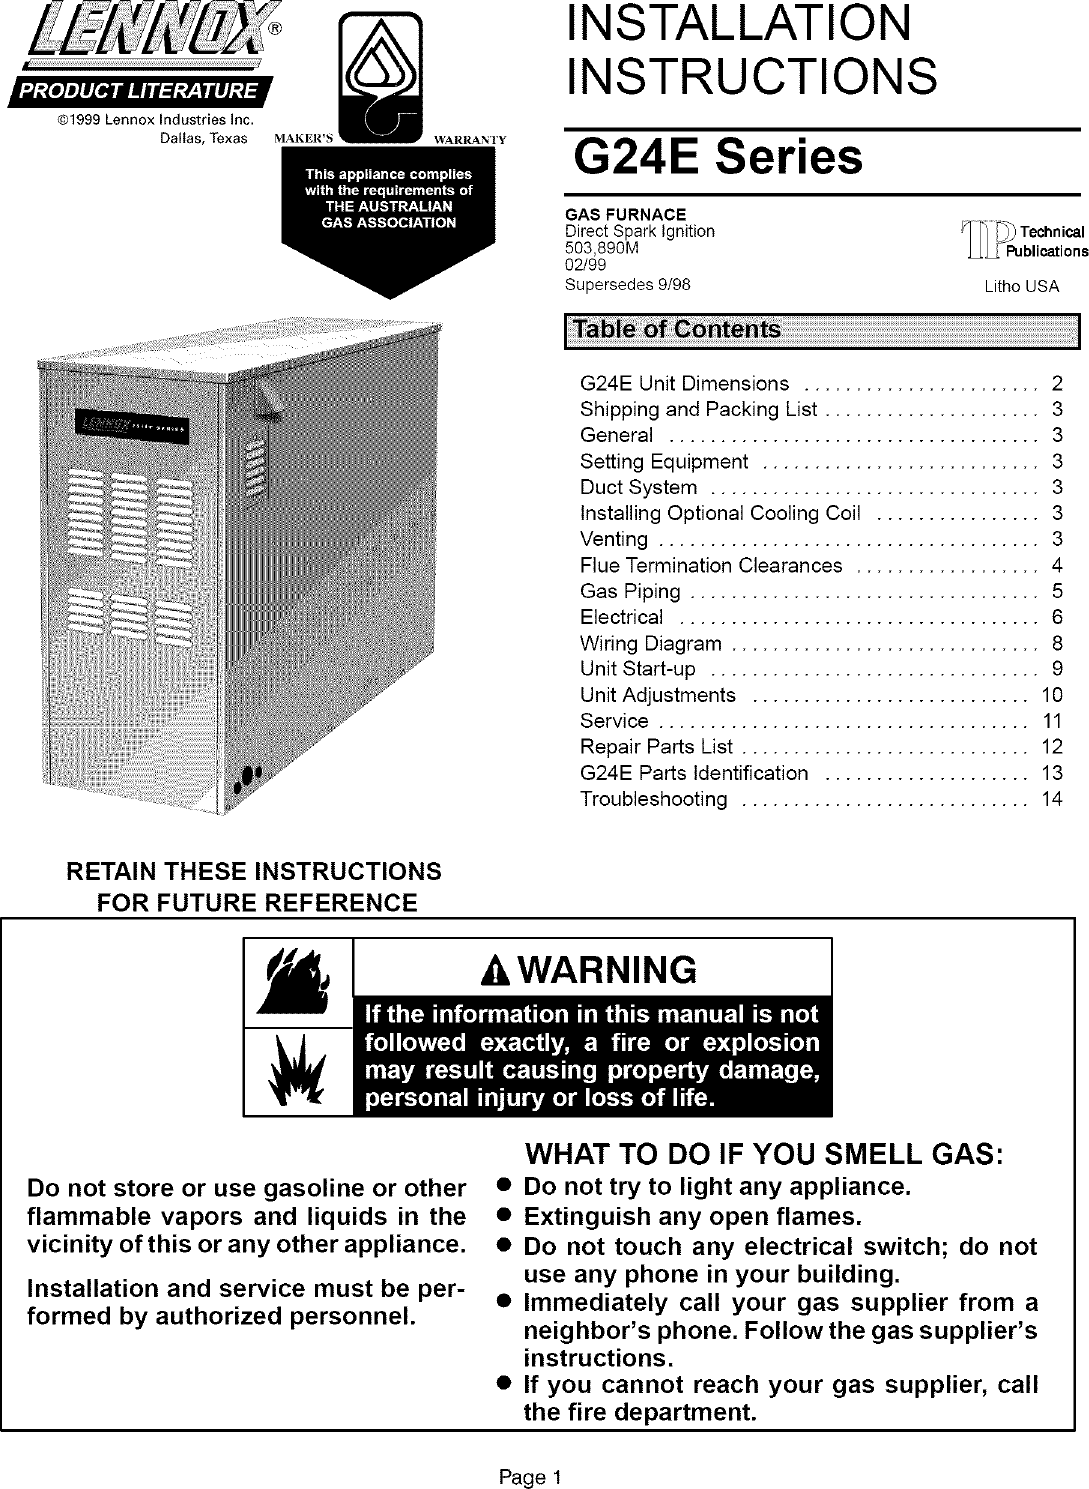 LENNOX Furnace/Heater, Gas Manual L0806144